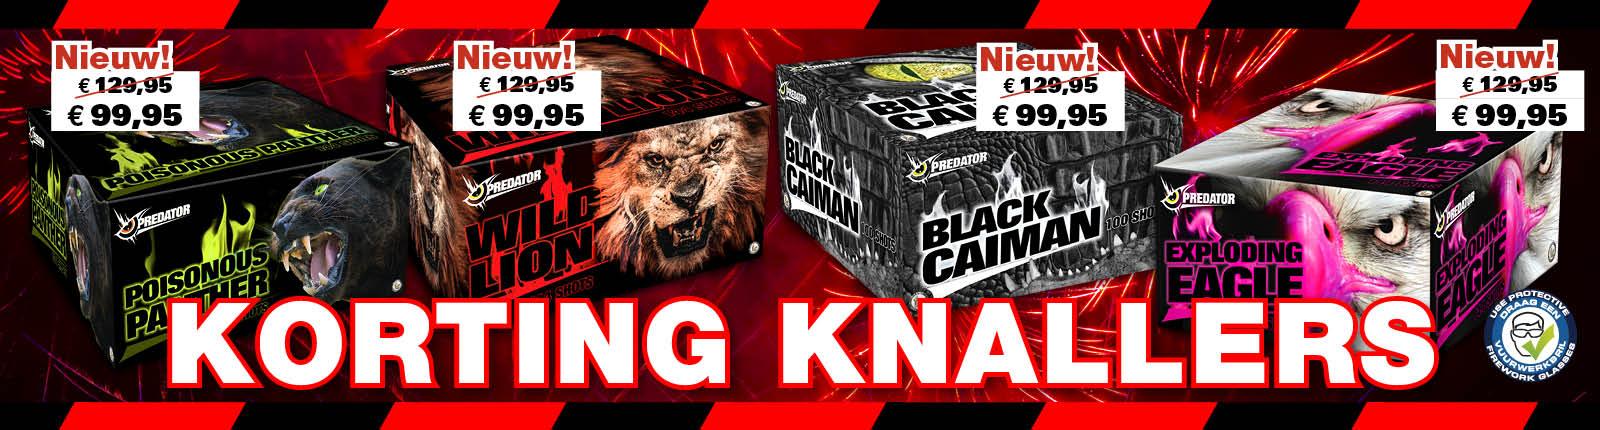 Korting-knallers-30mm